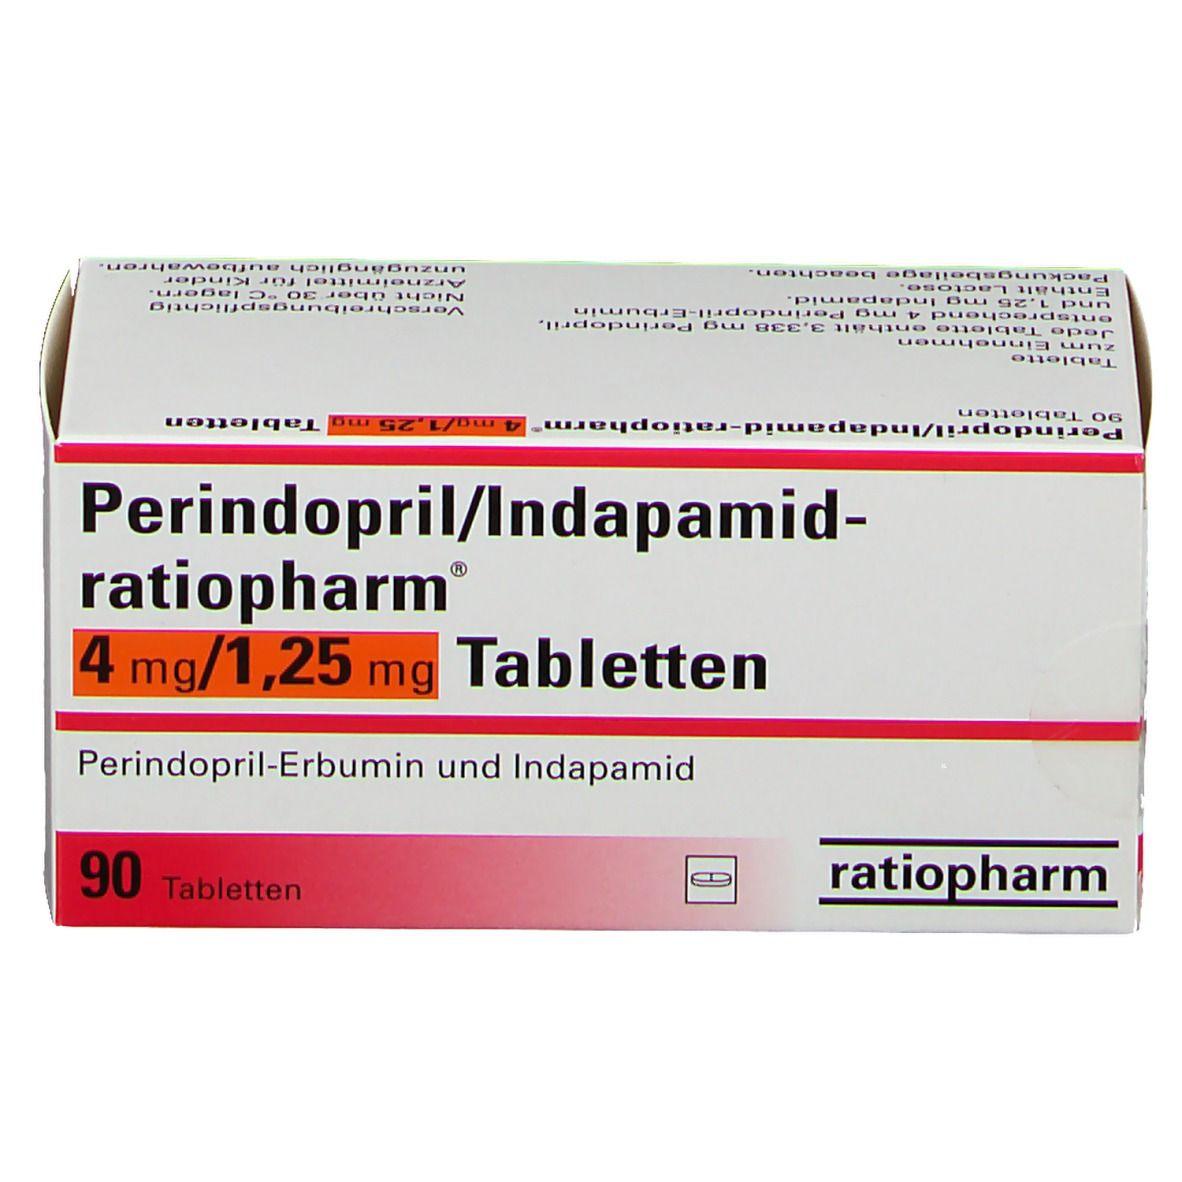 Perindopril Indapamid ratiopharm 4mg/1,25mg Tabletten